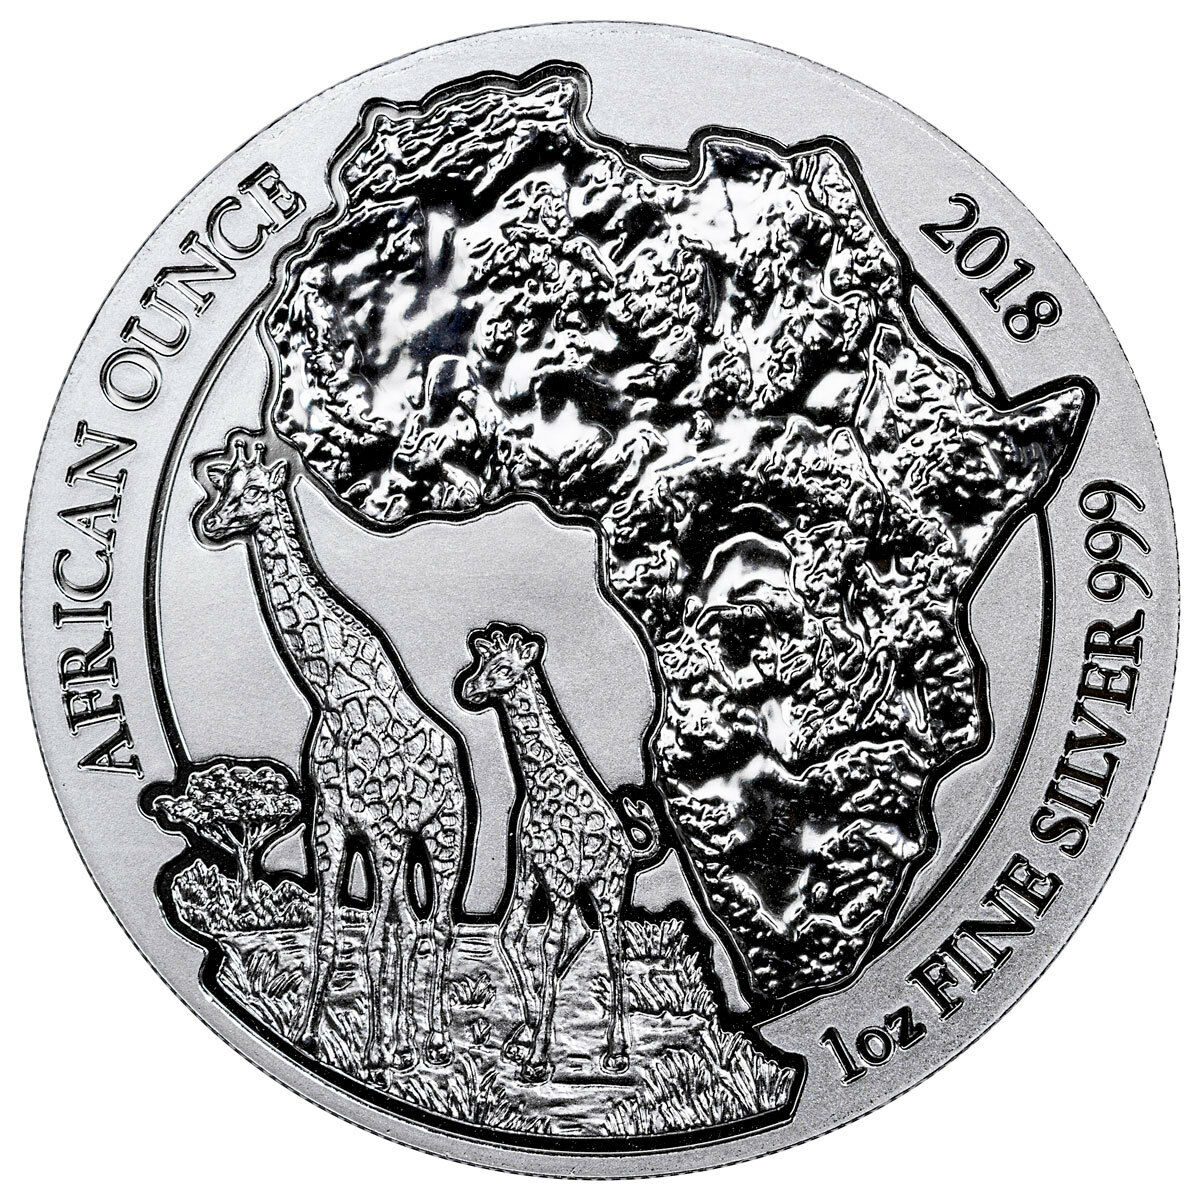 2018 Rwanda African Ounce - Giraffe 1 oz Silver Fr.50 Coin GEM BU SKU52004